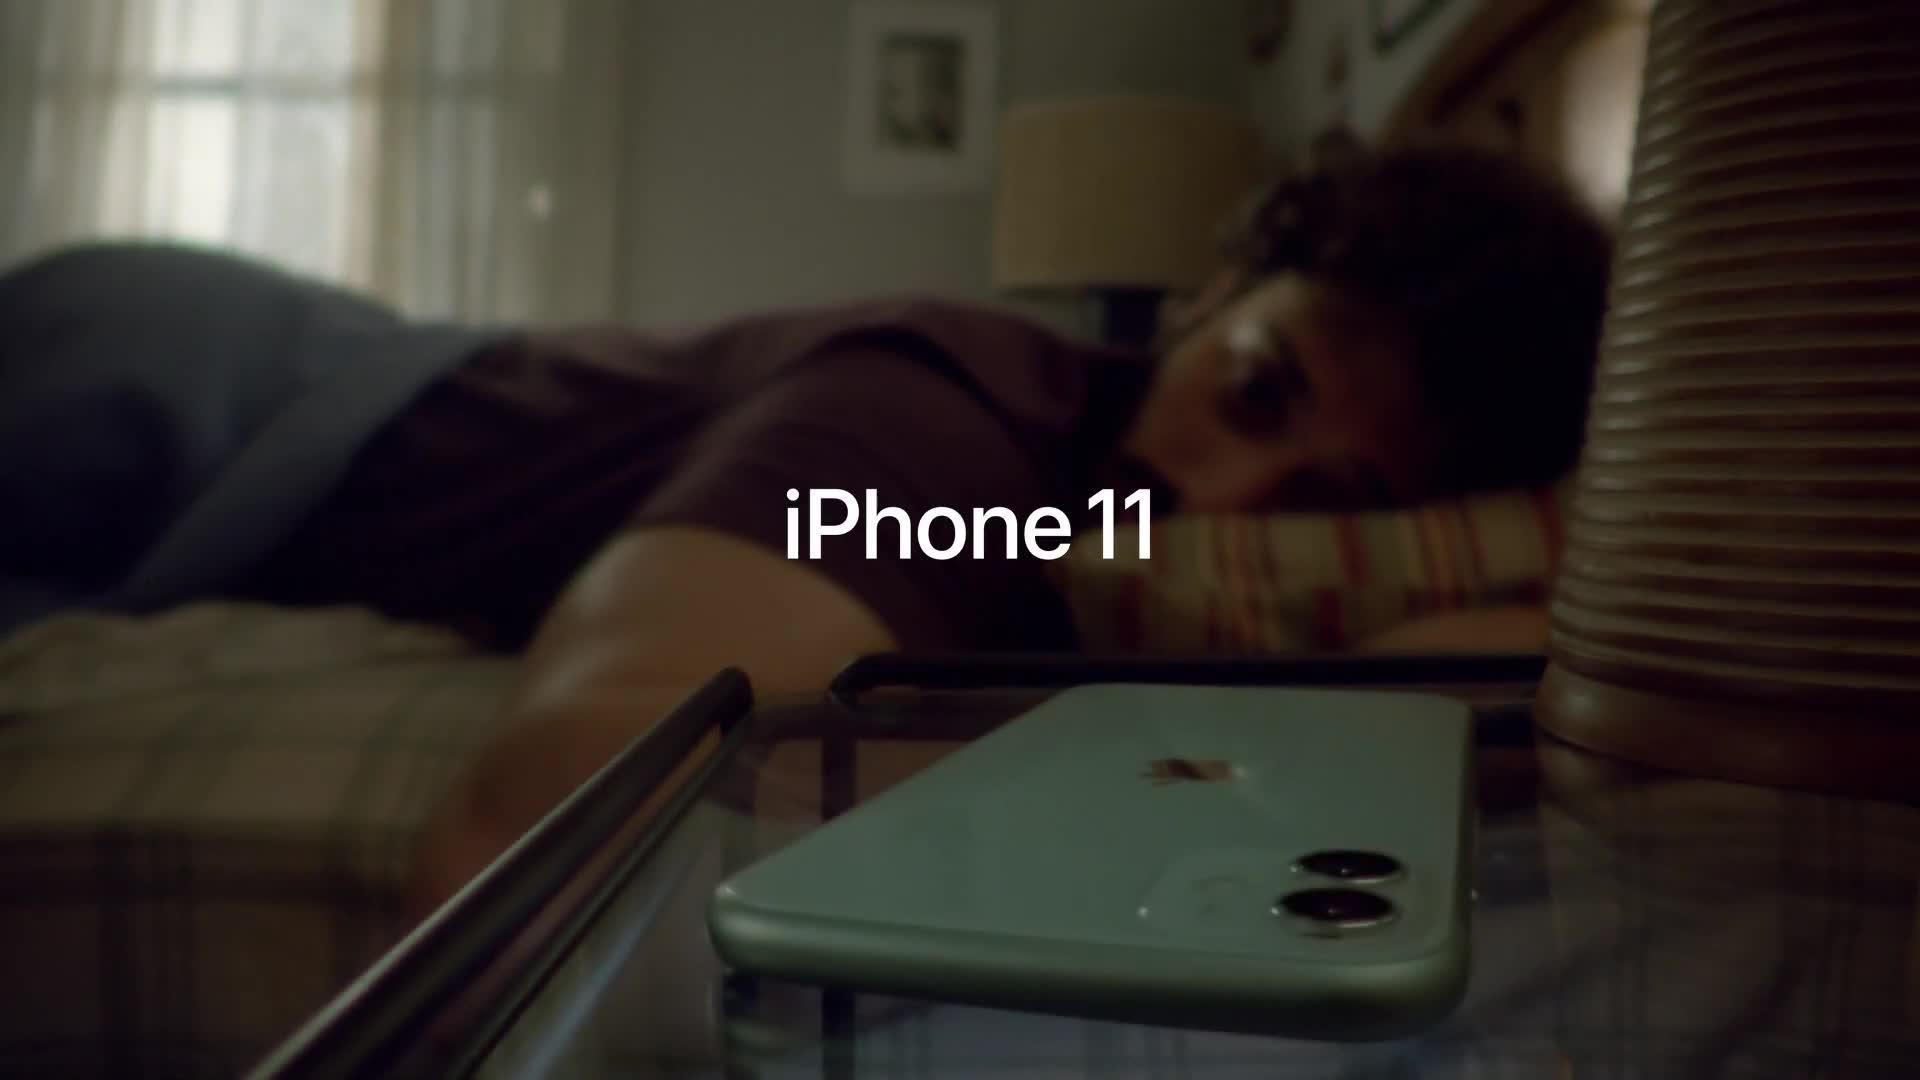 Smartphone, Apple, Iphone, iPhone 11, Apple iPhone 11